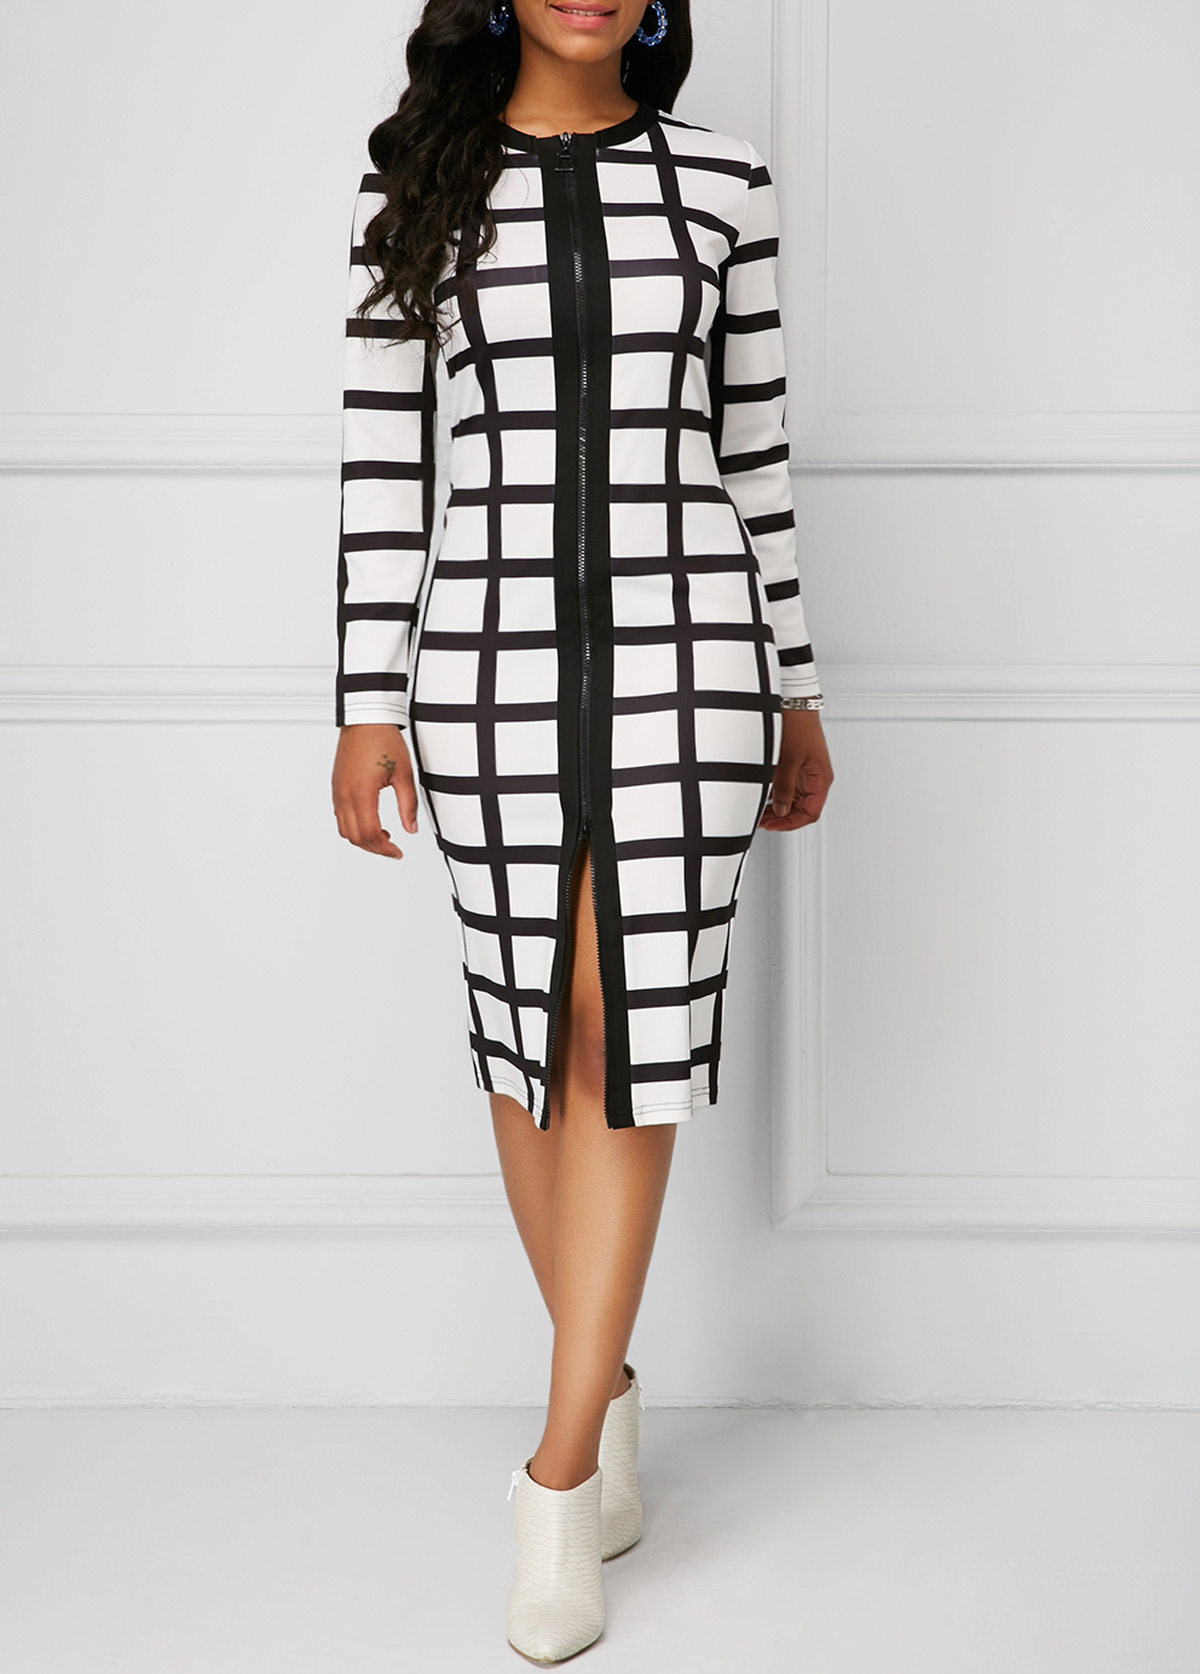 2019 Plus Size Fashion Women Dress 5xl New Autumn And Winter Dress Casual Black And White Plaid Zipper Slim Office Tight Dress